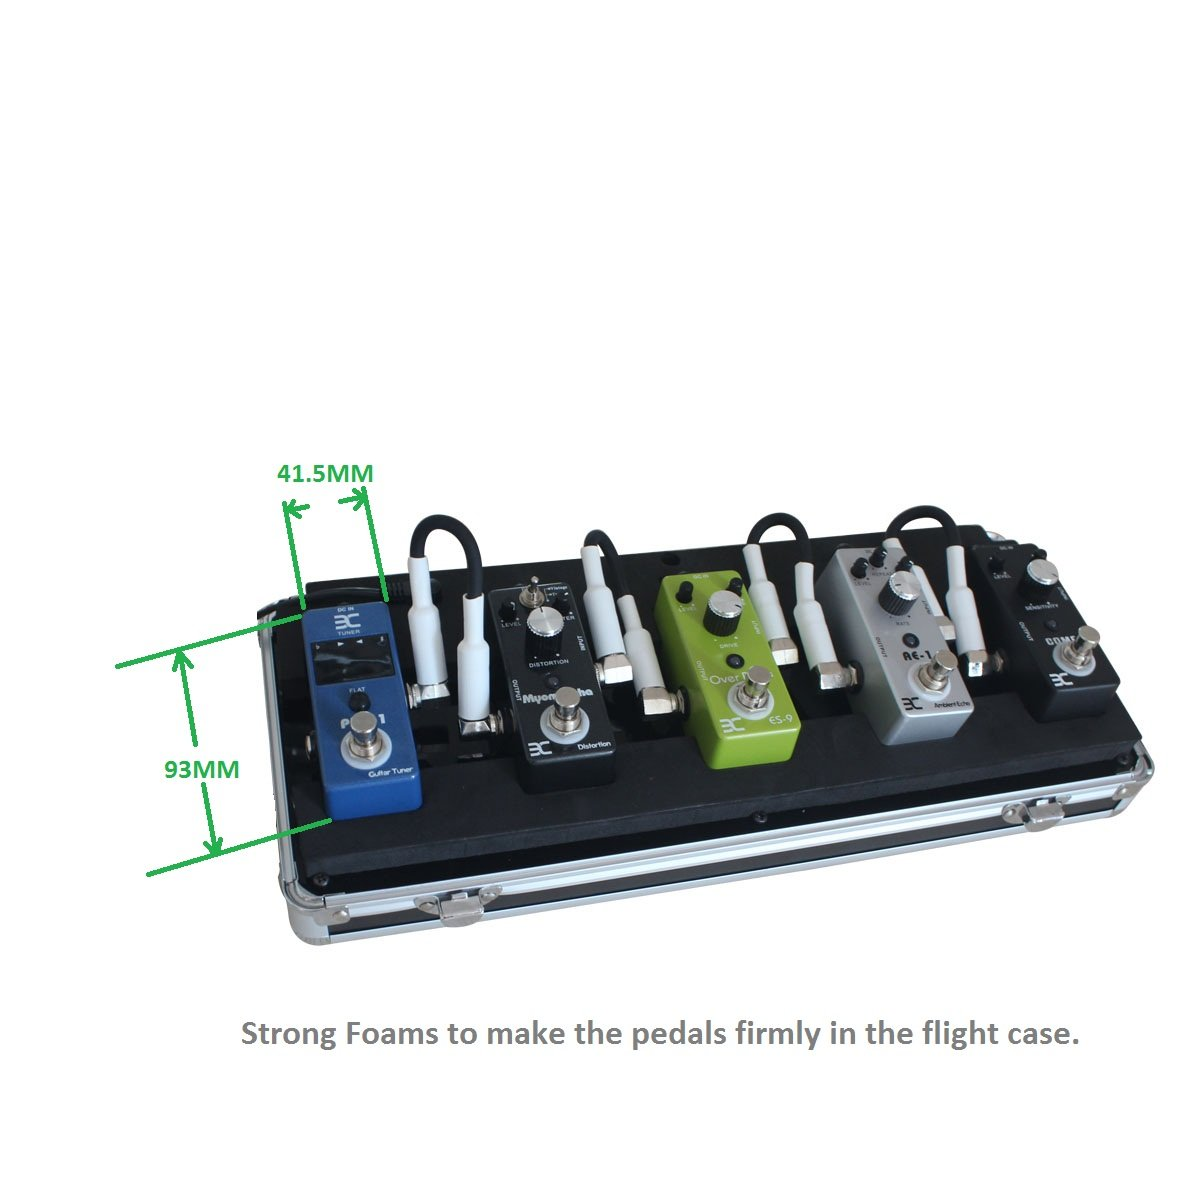 ENO EX QQ Case 5-Pedal Pedalboard/Electronic Guitar Effects Pedals Flight Case by Effects Pedals Flight Case (Image #6)